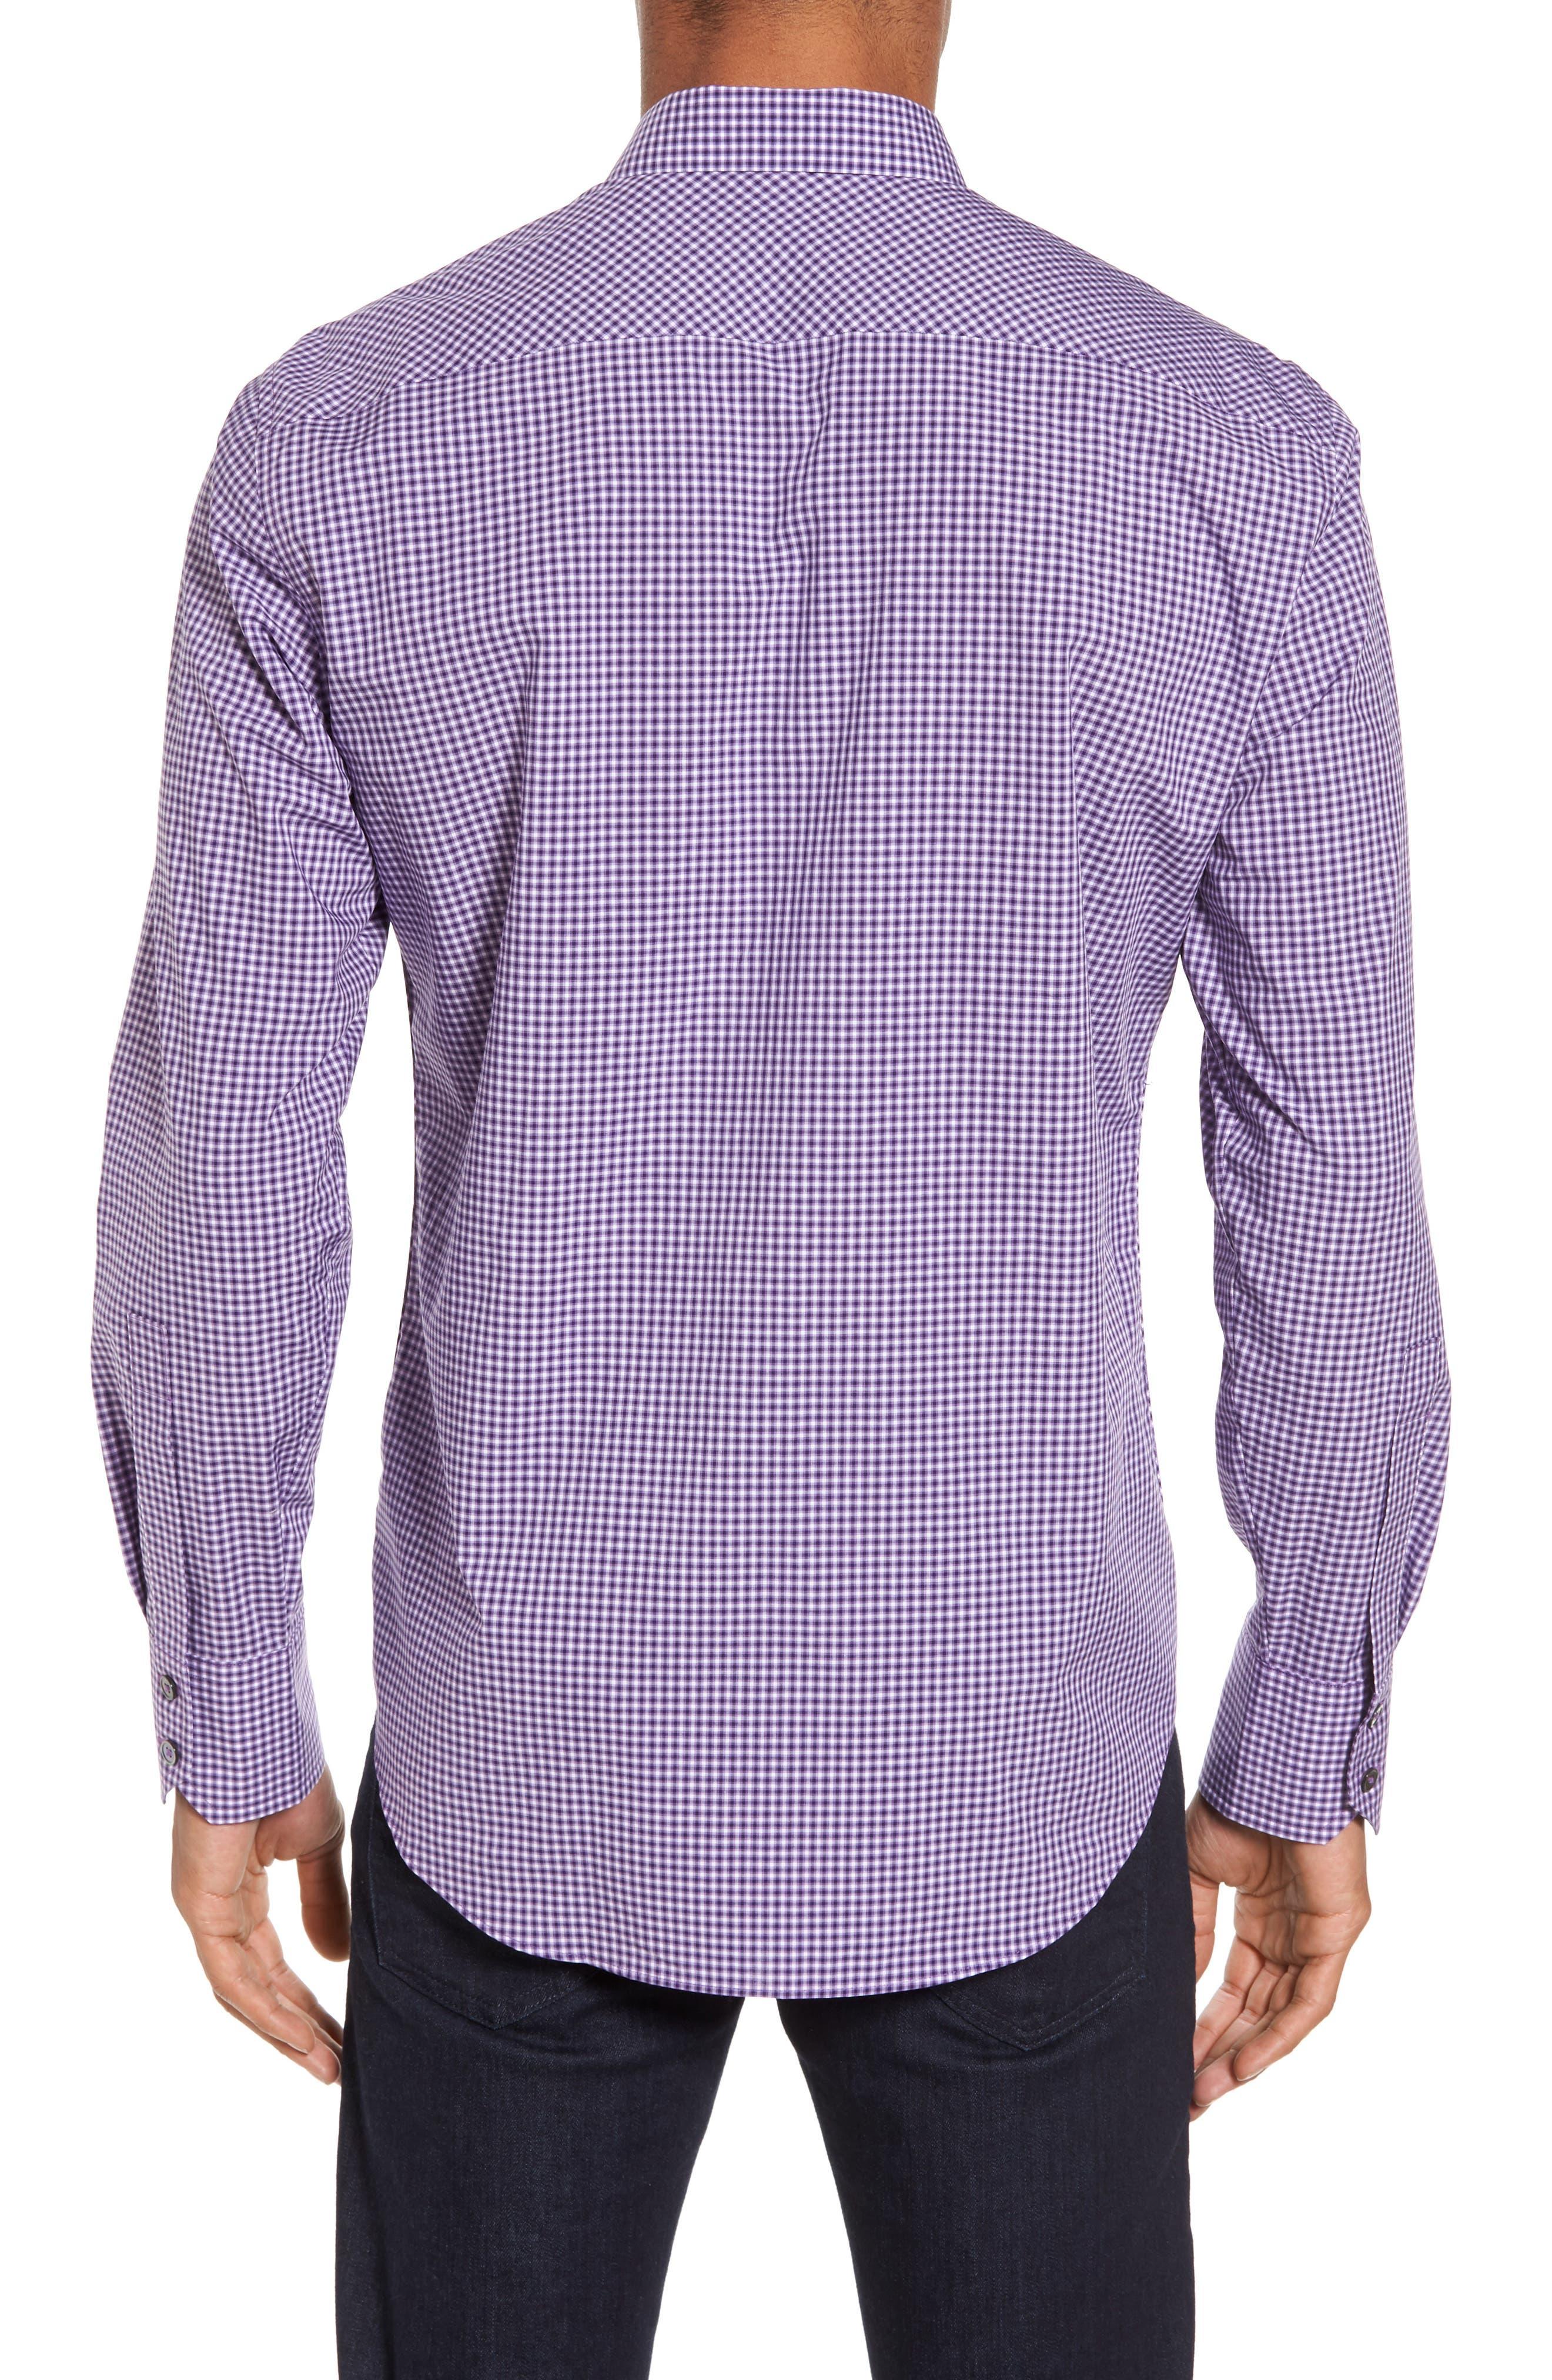 Pawlata Slim Fit Check Sport Shirt,                             Alternate thumbnail 2, color,                             500